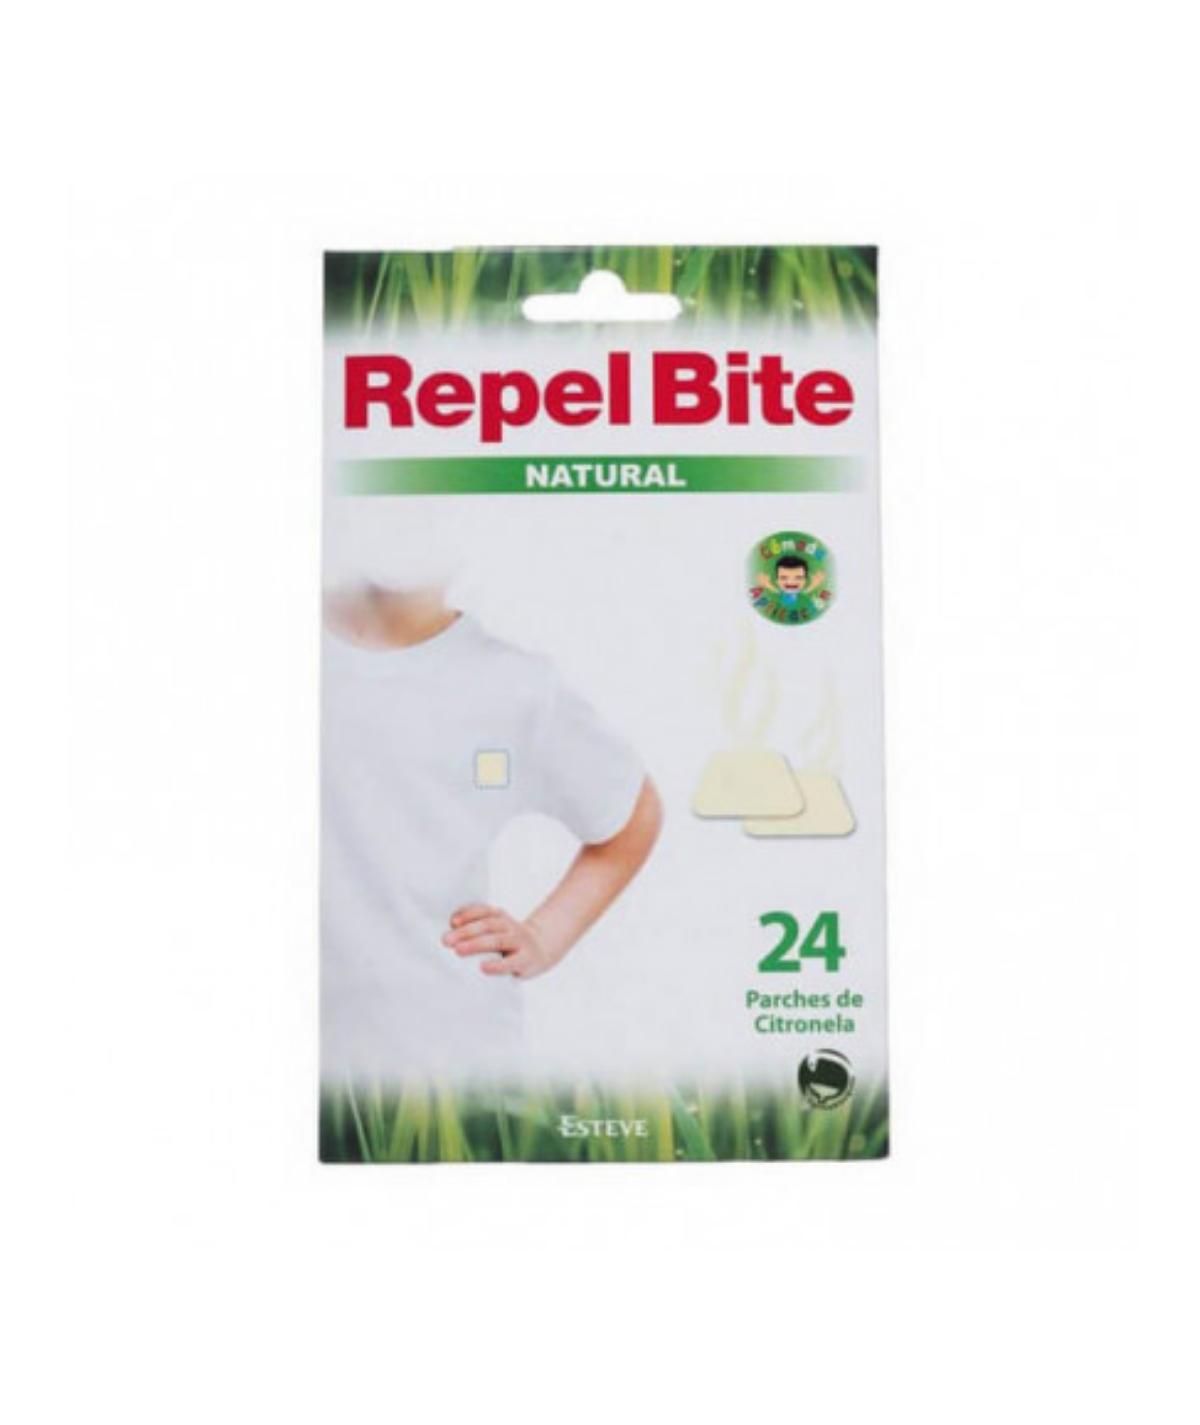 REPEL BITE NATURAL 24 APLICACIONES